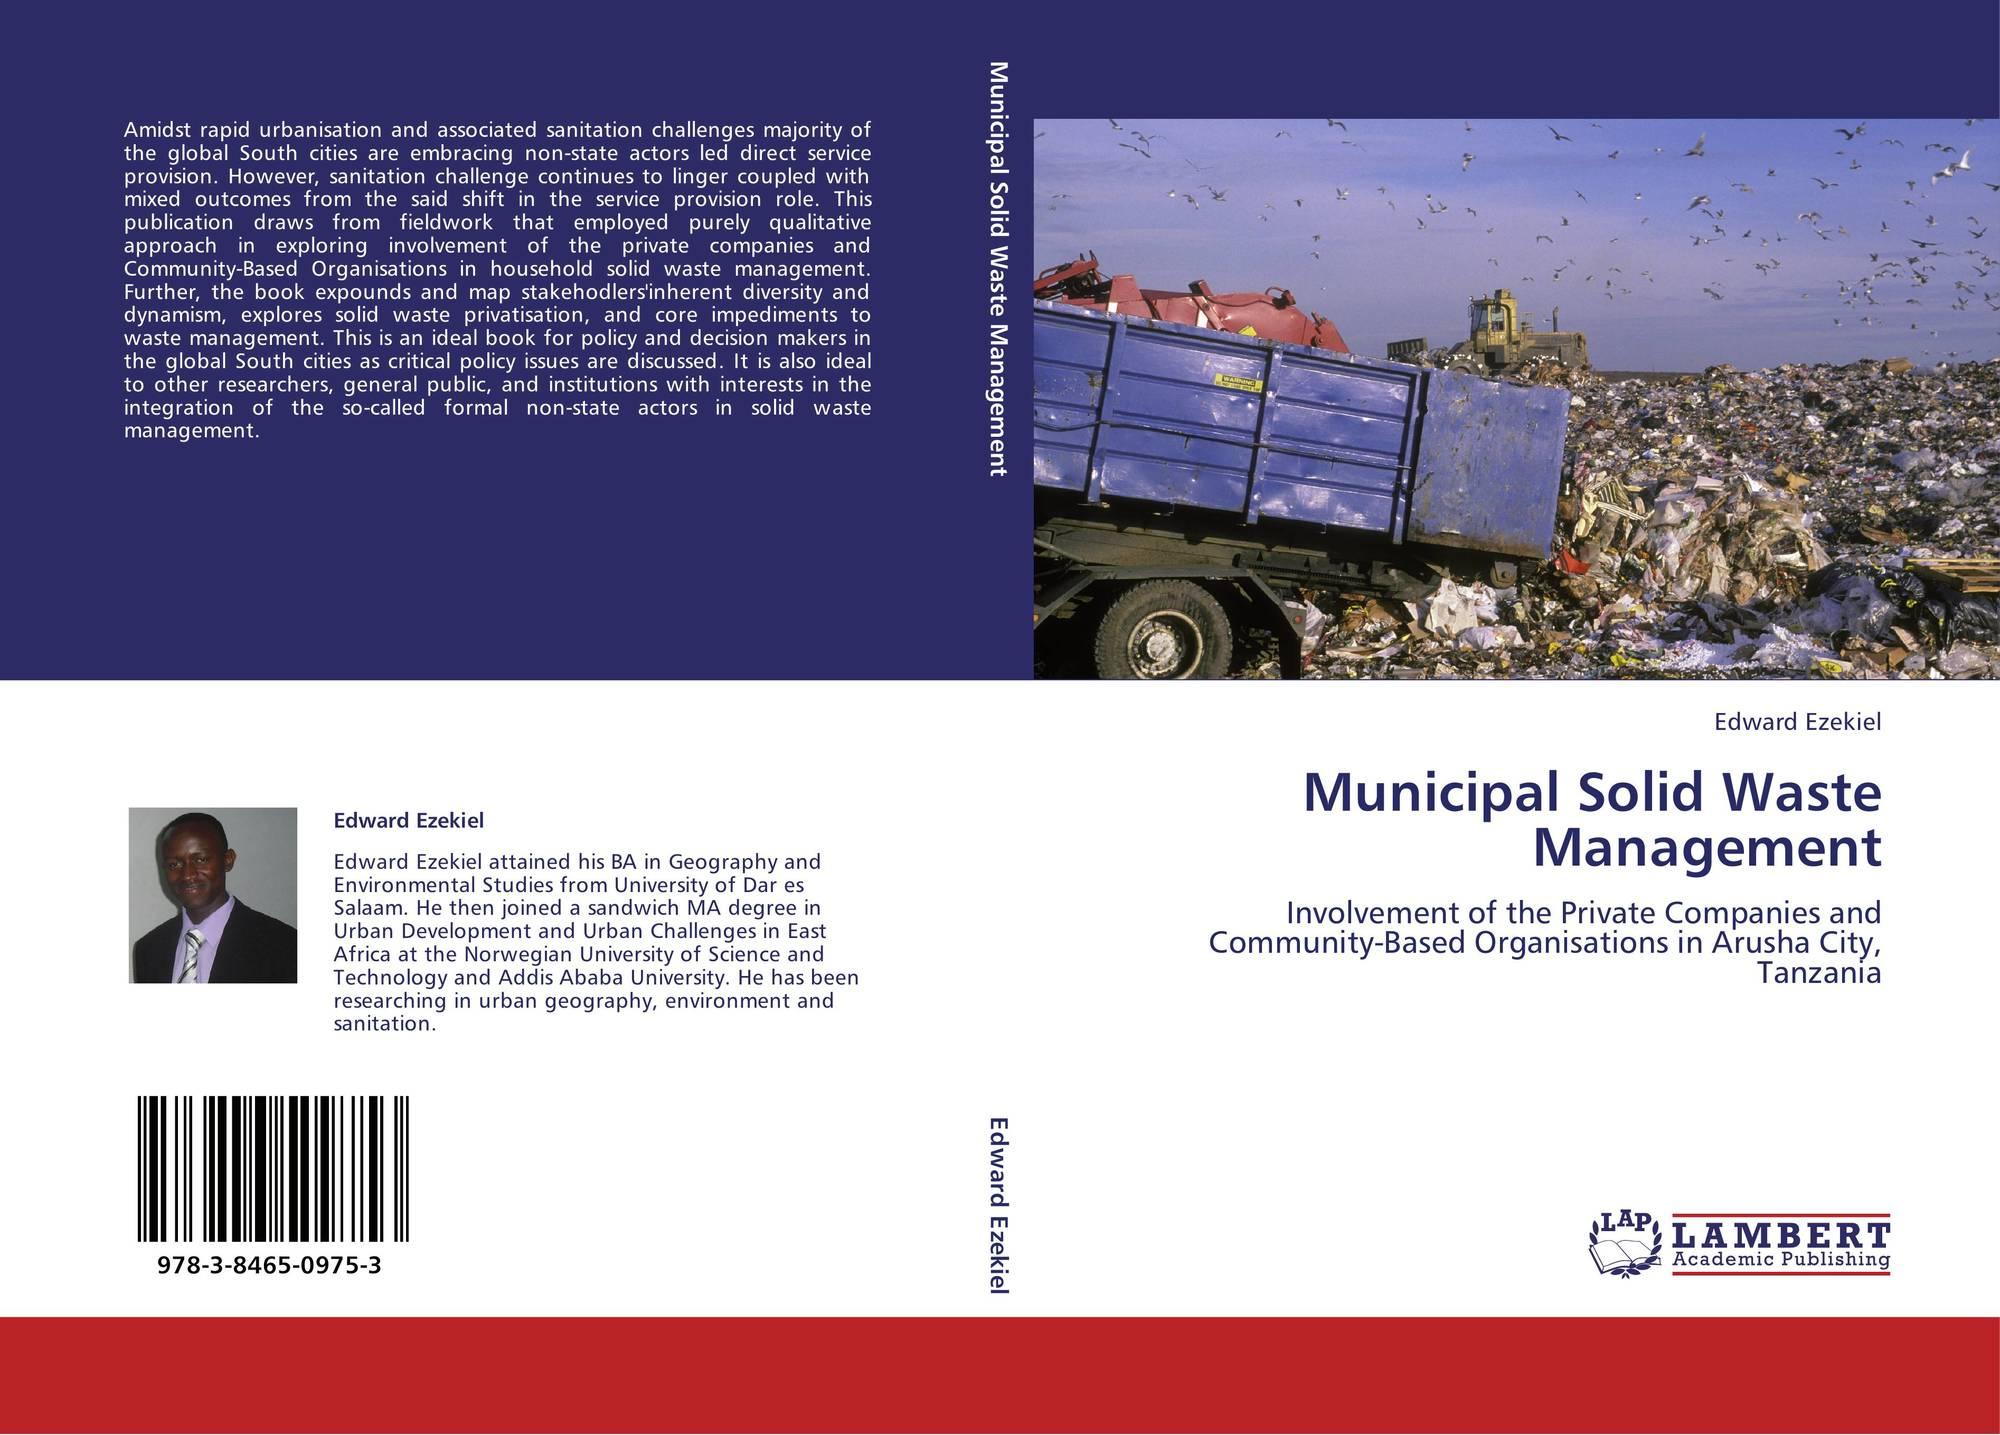 Municipal Solid Waste Management, 978-3-8465-0975-3